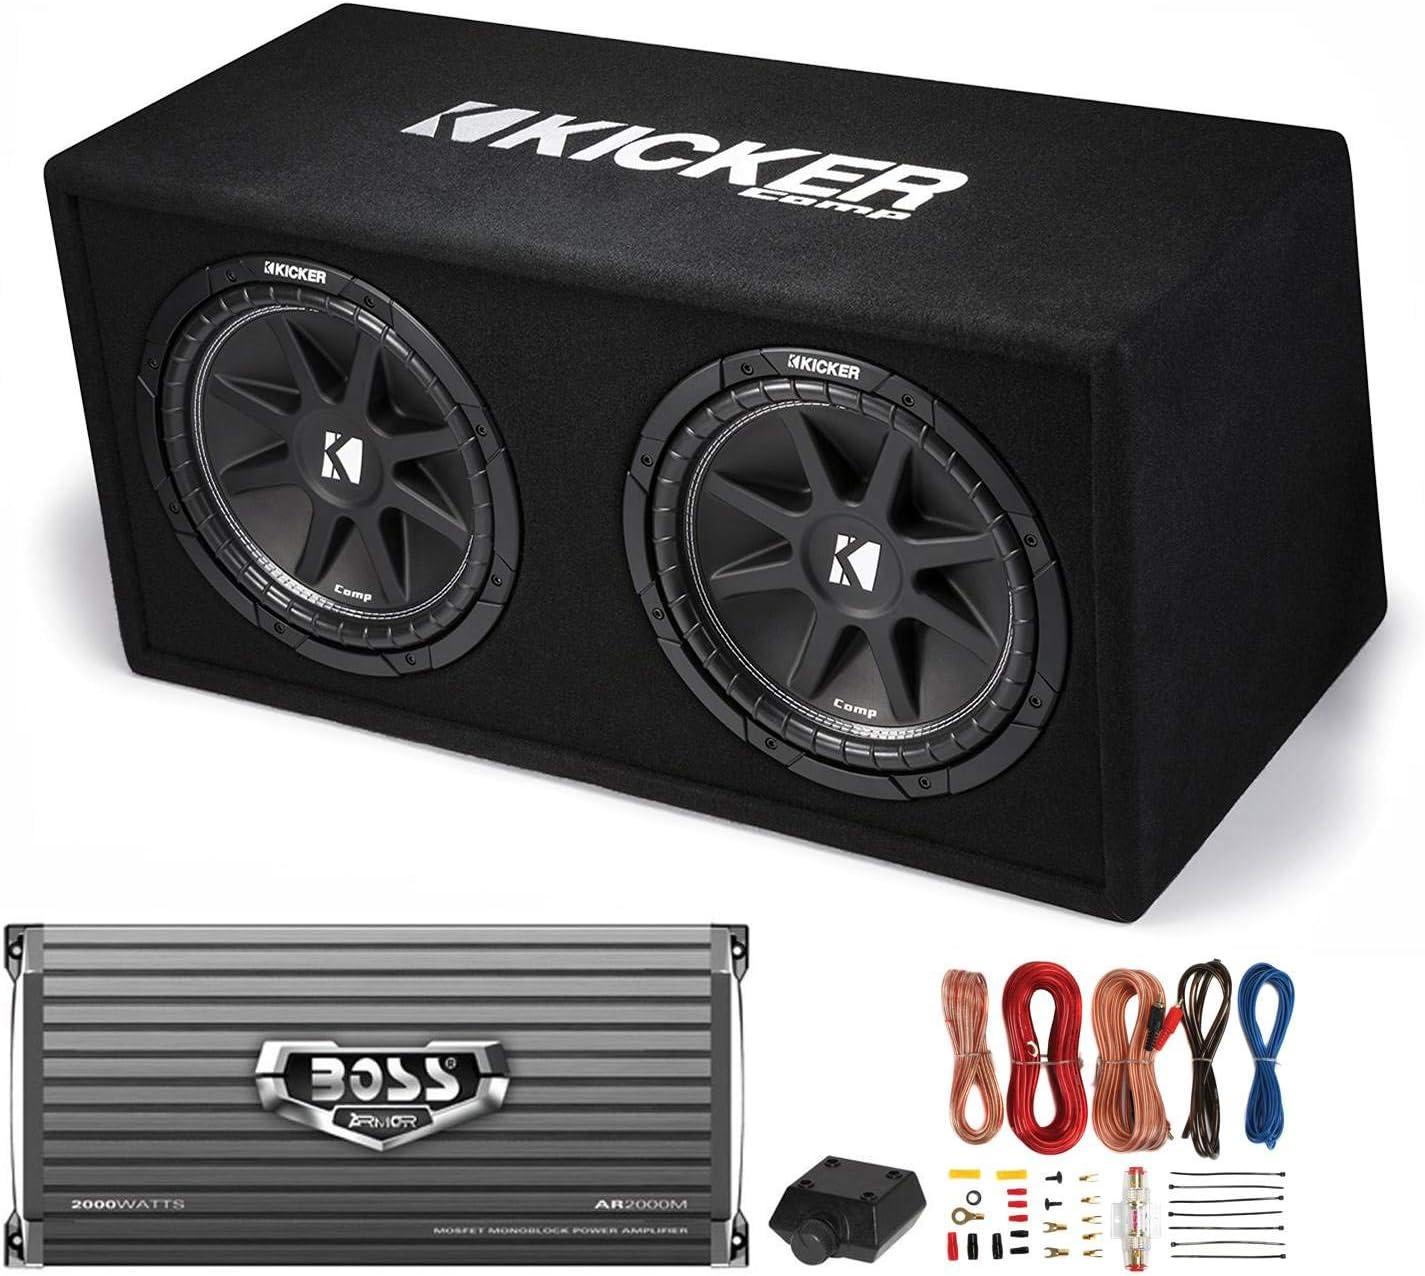 "Kicker DC122 Dual 12"" 600W Car Audio Subwoofers + Box + Boss 2000W Amp + Amp Kit"